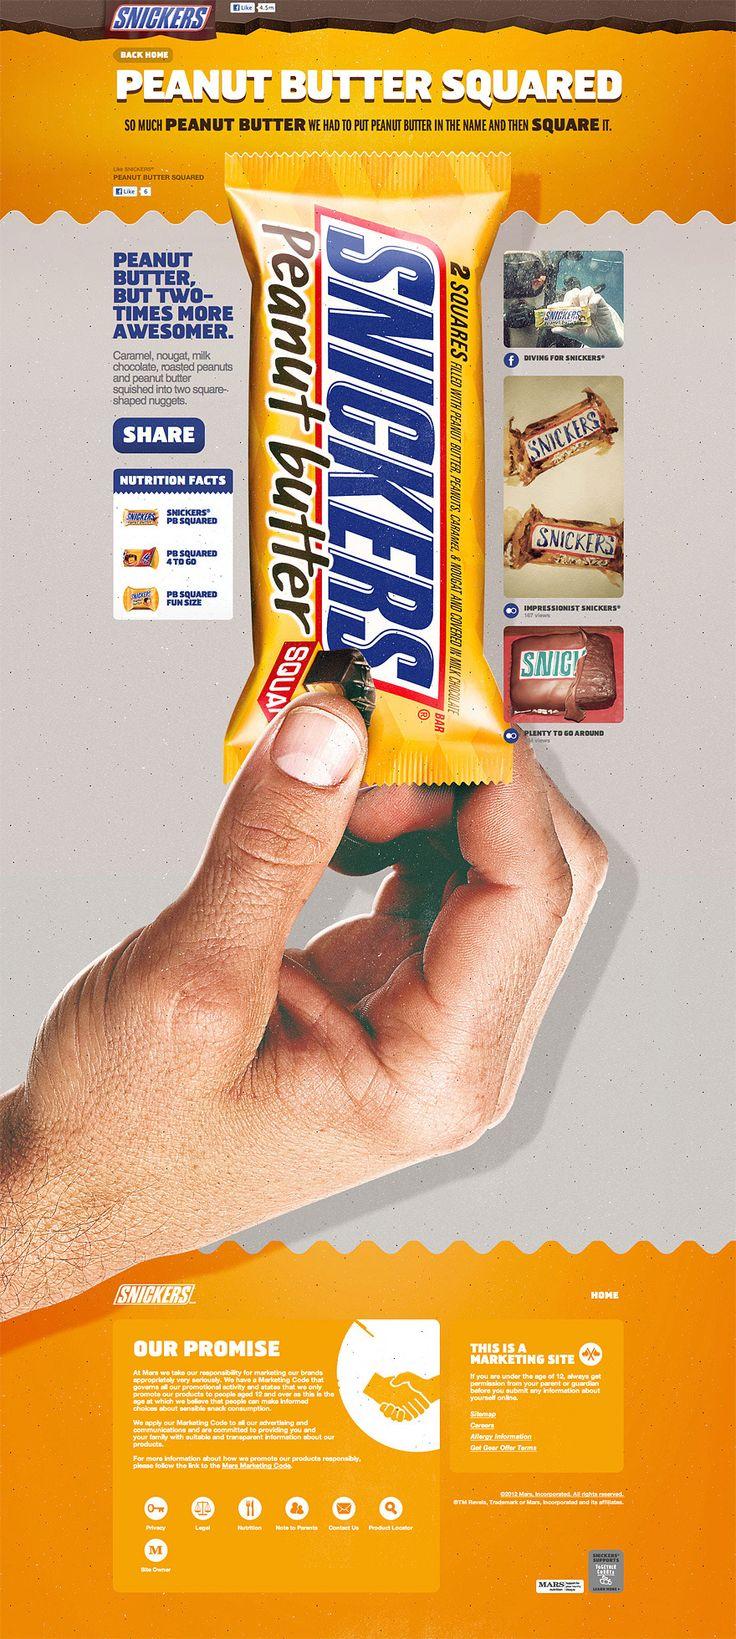 Snickers.com - Ricardo Landim